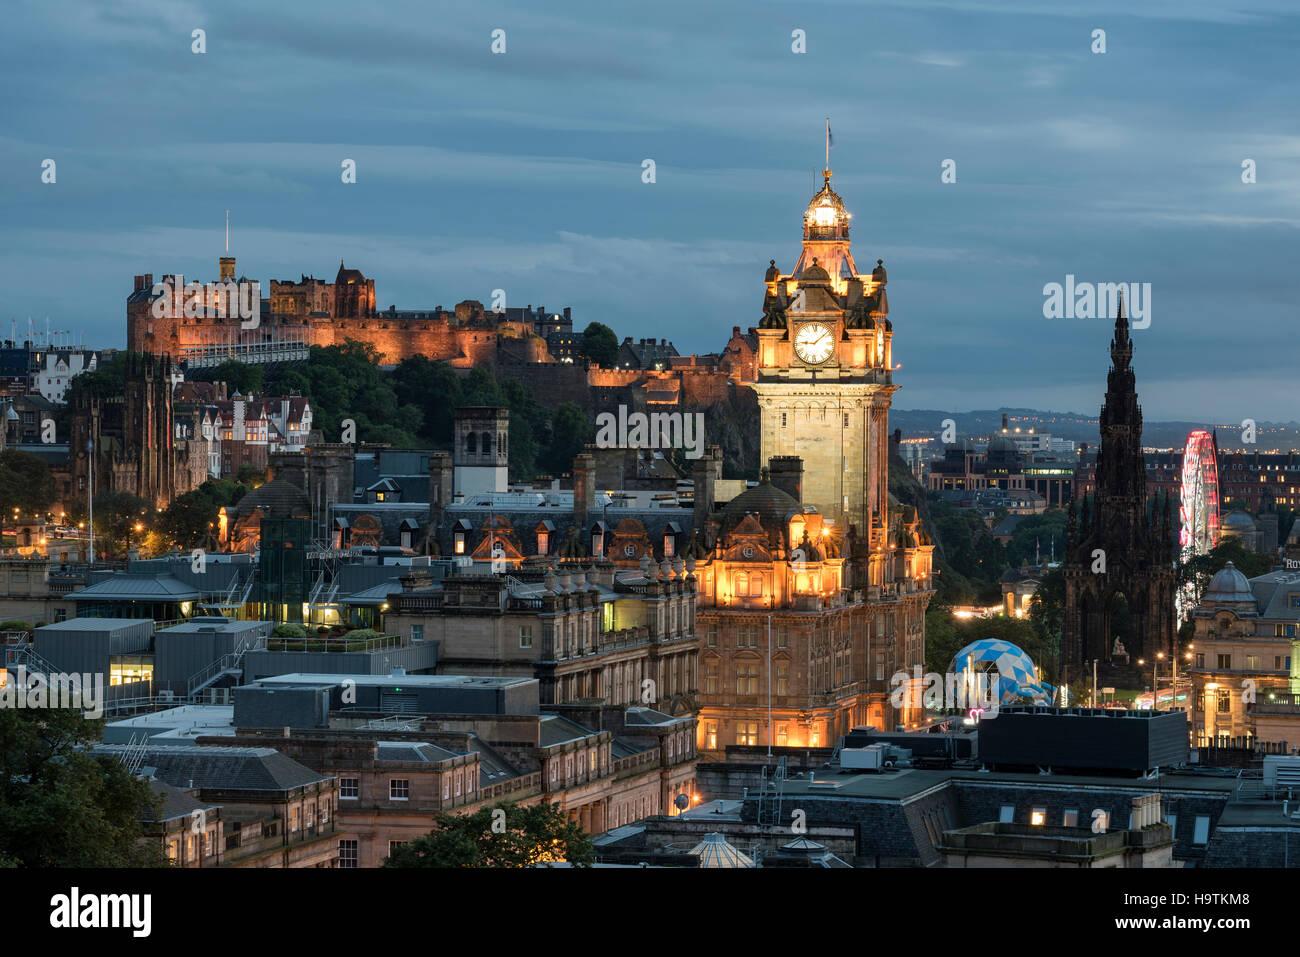 View of historic centre of Edinburgh with Balmoral Hotel tower and Edinburgh Castle, Edinburgh, Scotland, United - Stock Image